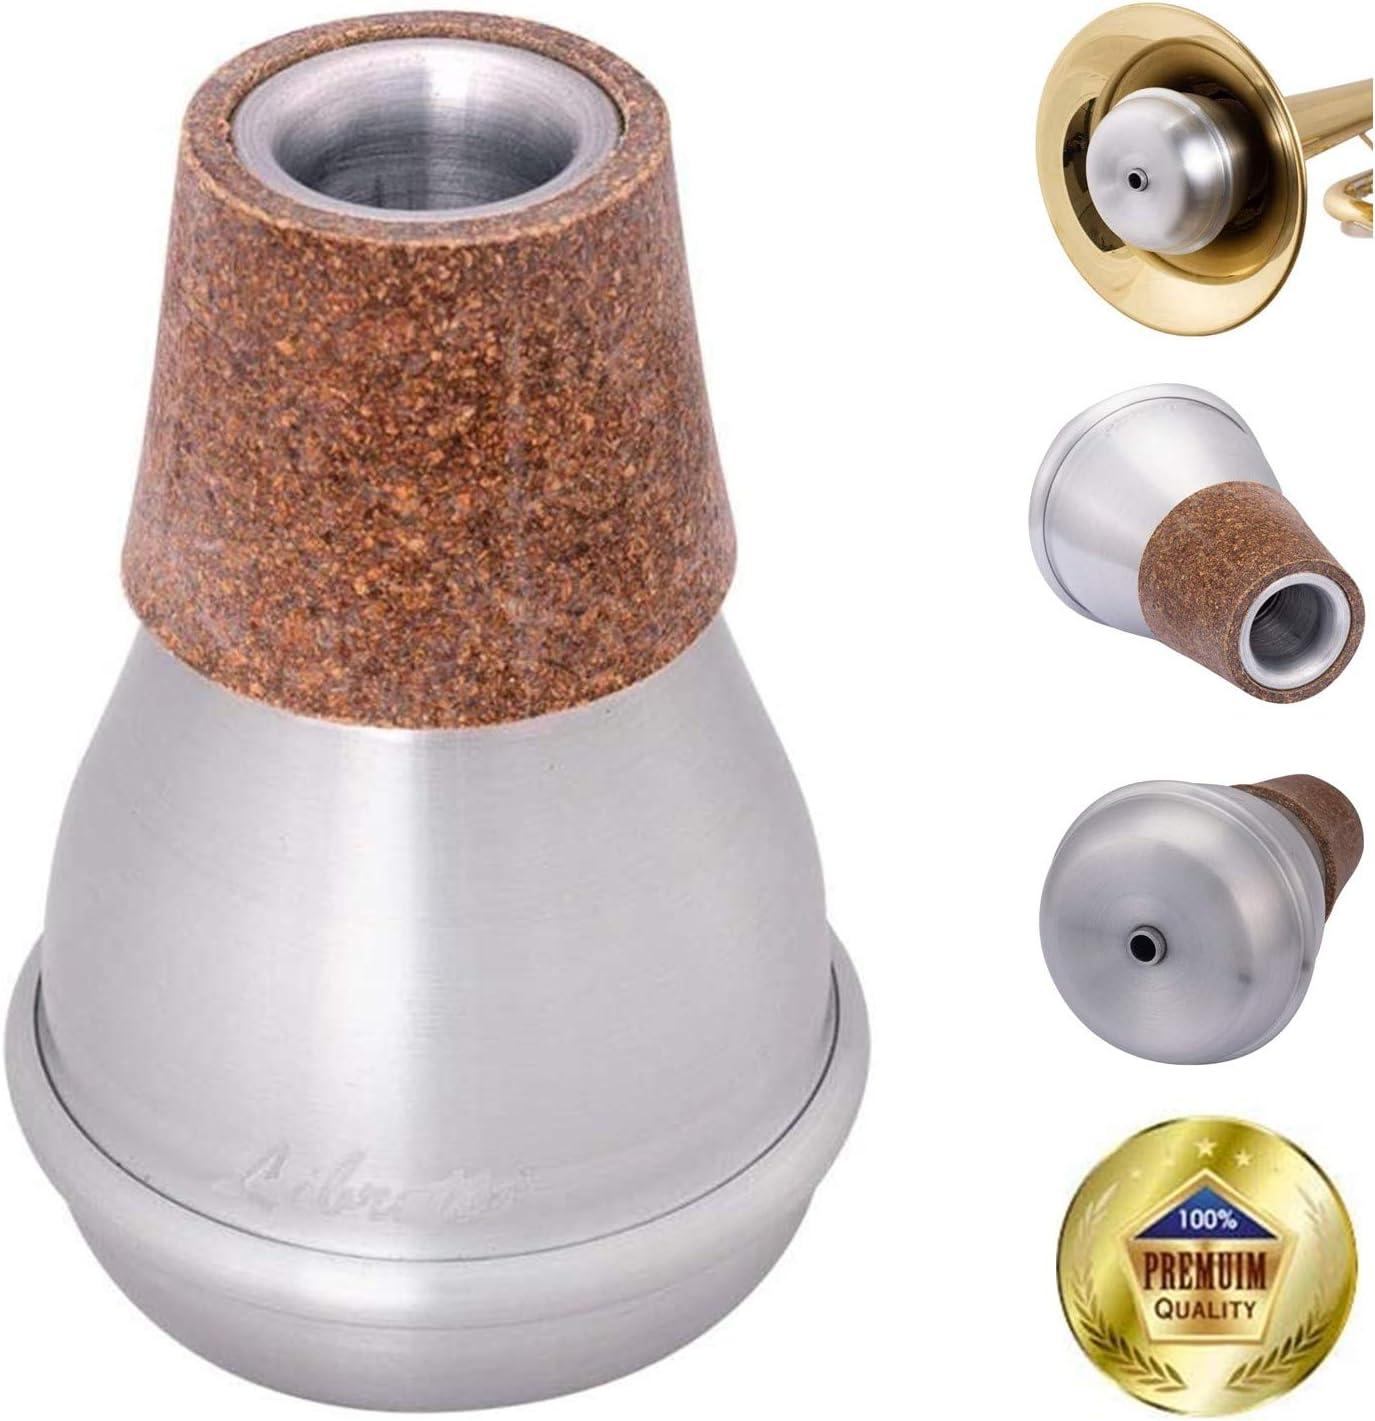 Libretto Trumpet Mute Silencer, AC011-7, Practice Mute, All Aluminum, Excellent for Practice Purpose